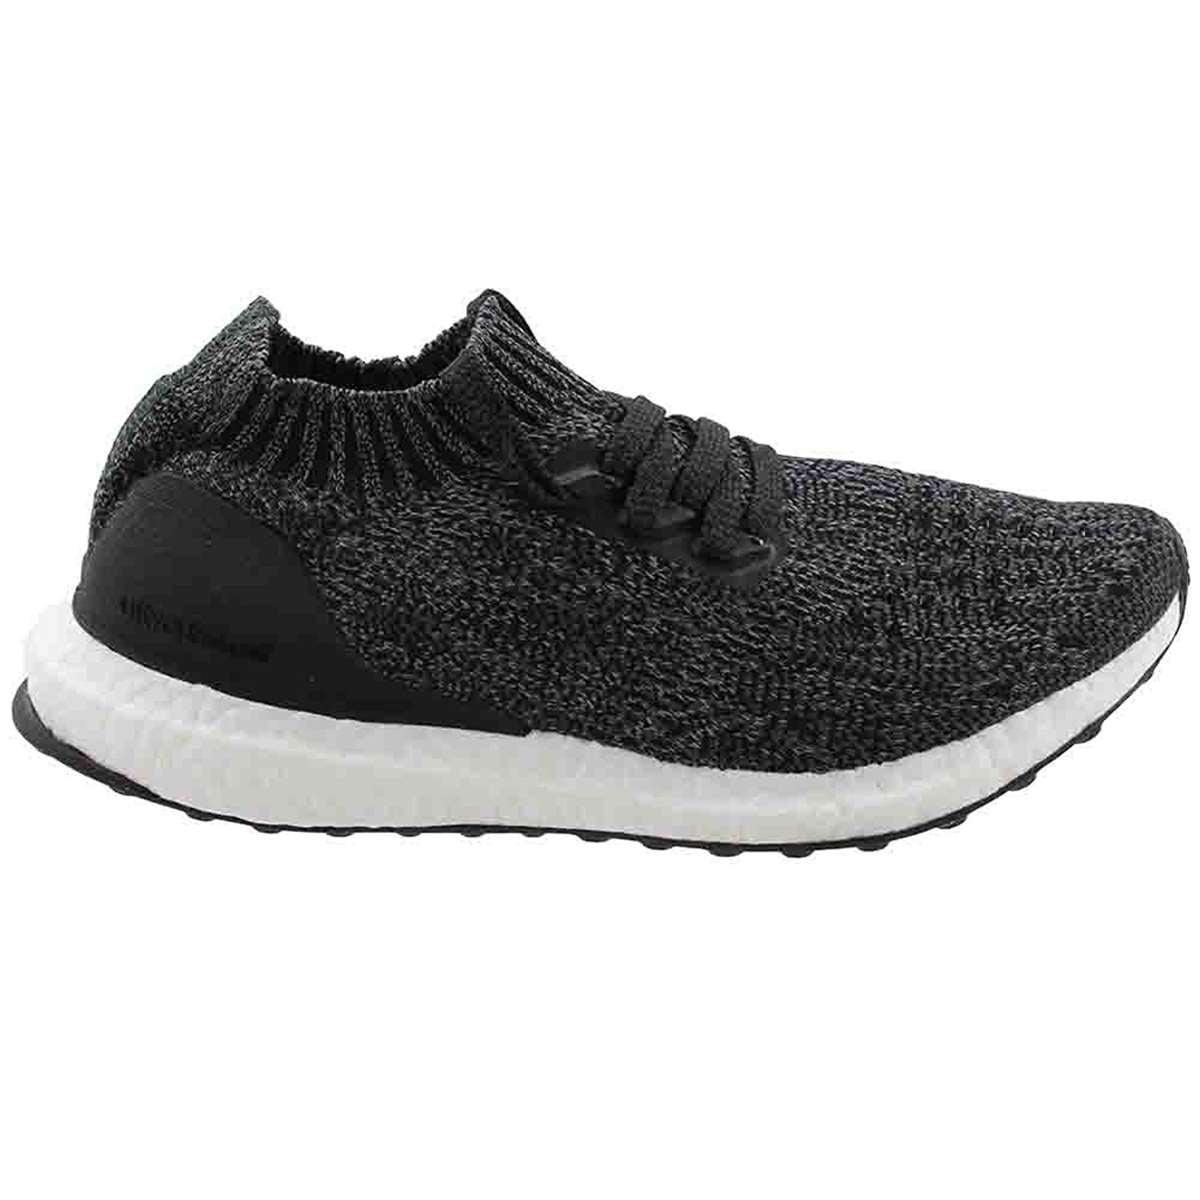 Adidas Boys Ultraboost Uncaged Shoe by Adidas